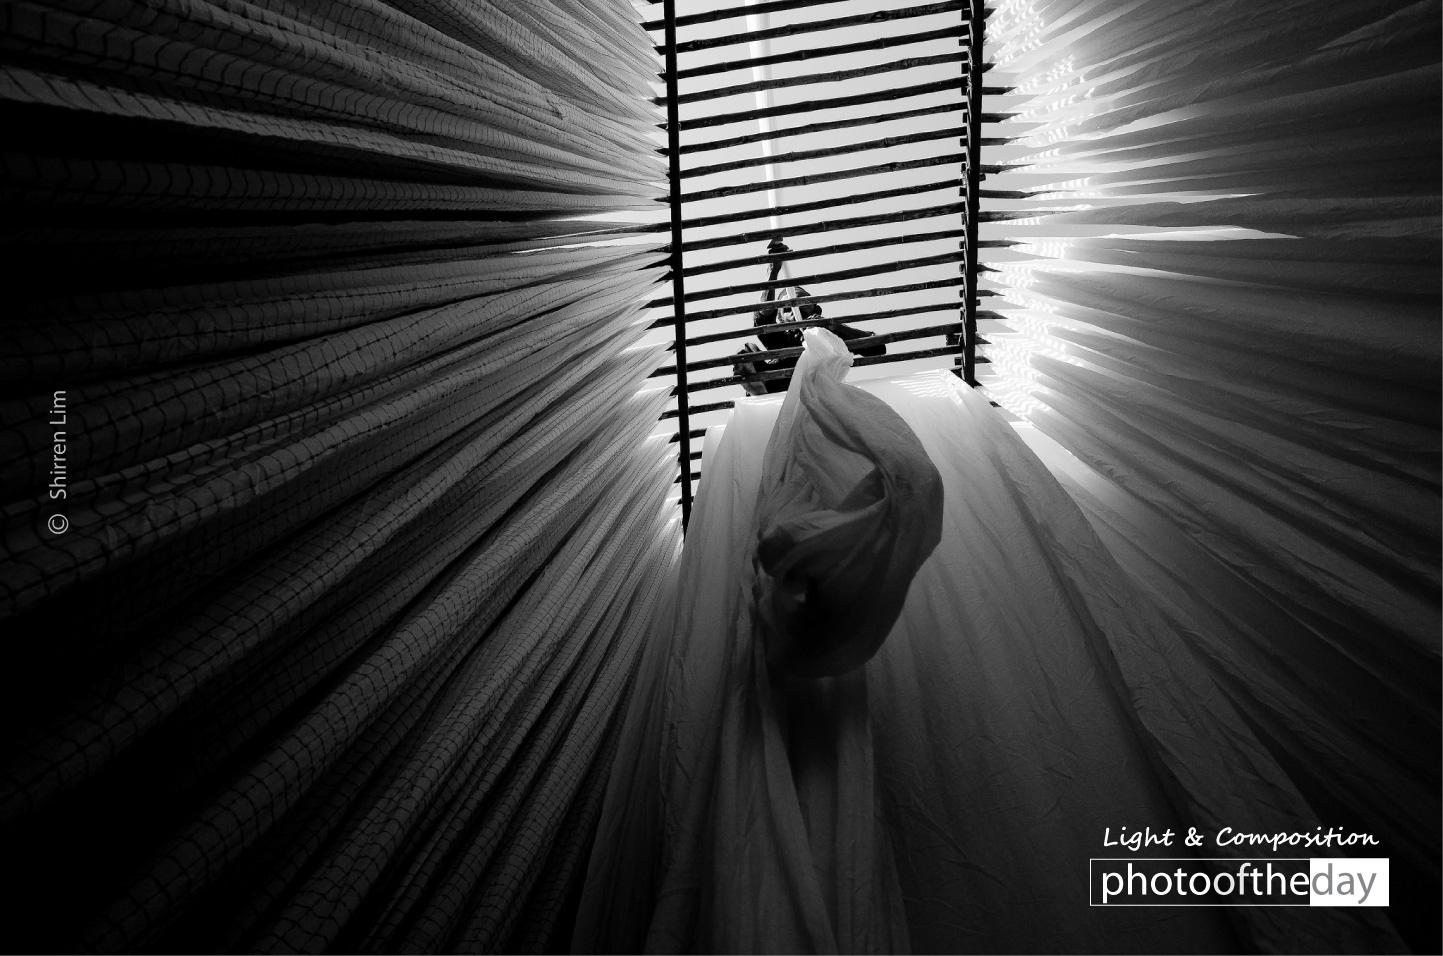 Cloth Maker by Shirren Lim